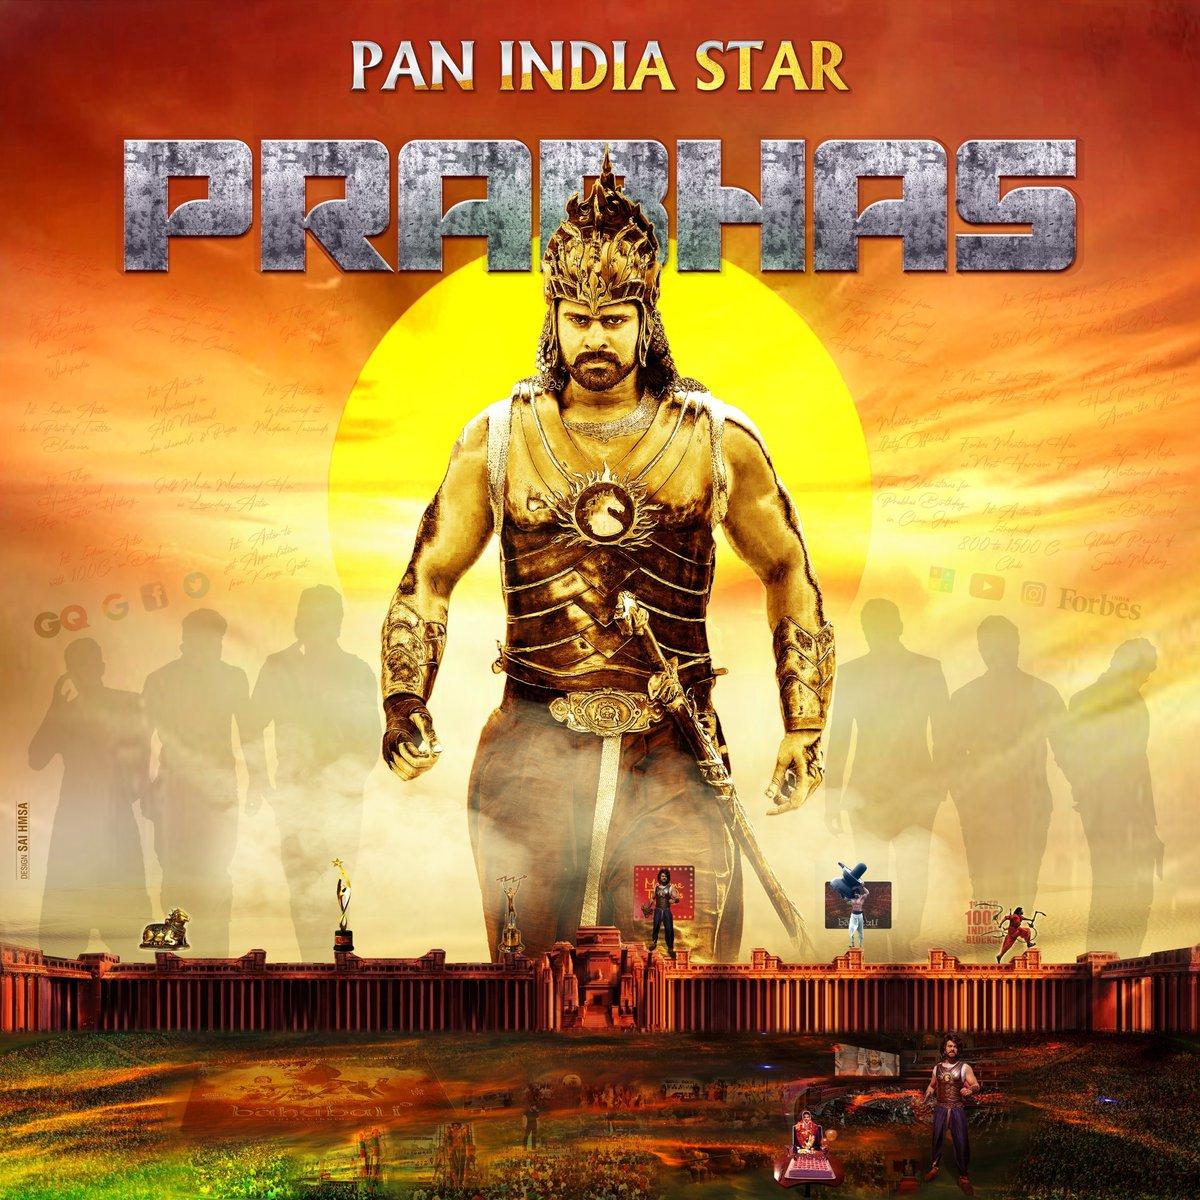 Come on rebals it's show time jai rebal star #RiseOfPanIndiaStarPrabhas pic.twitter.com/WDQNK1rRrg